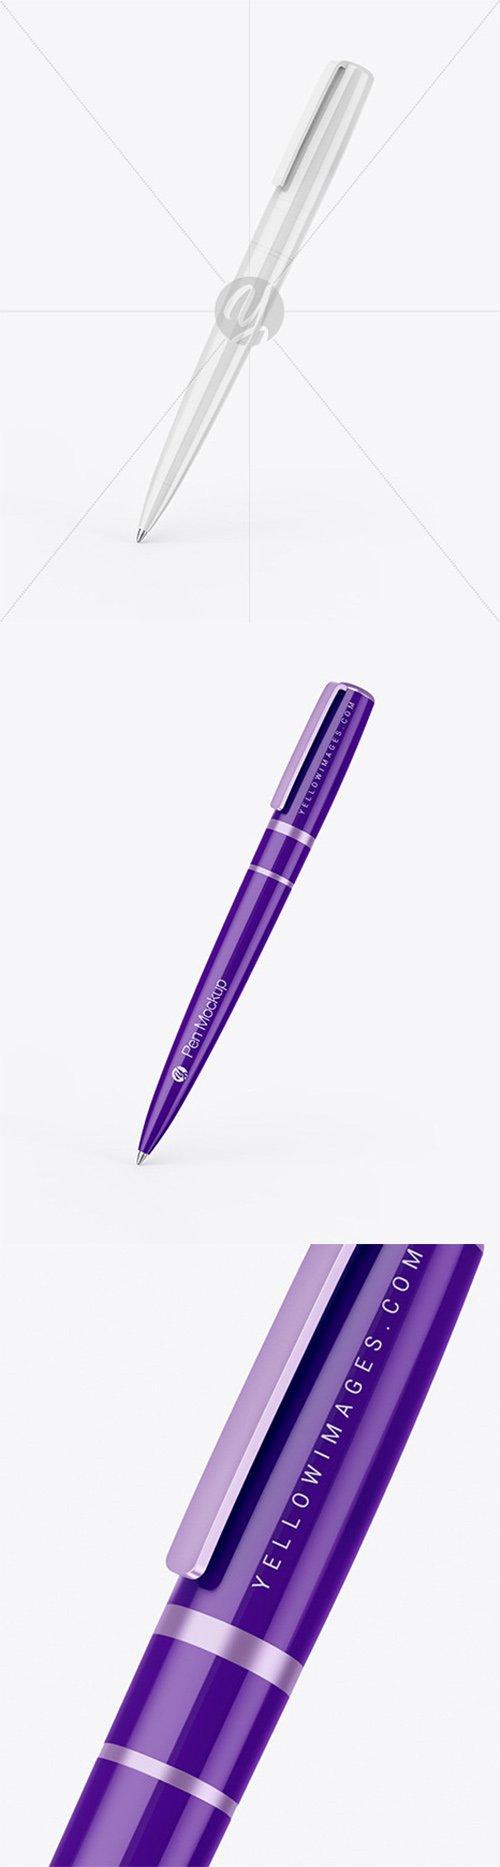 Glossy Pen Mockup 59660 TIF